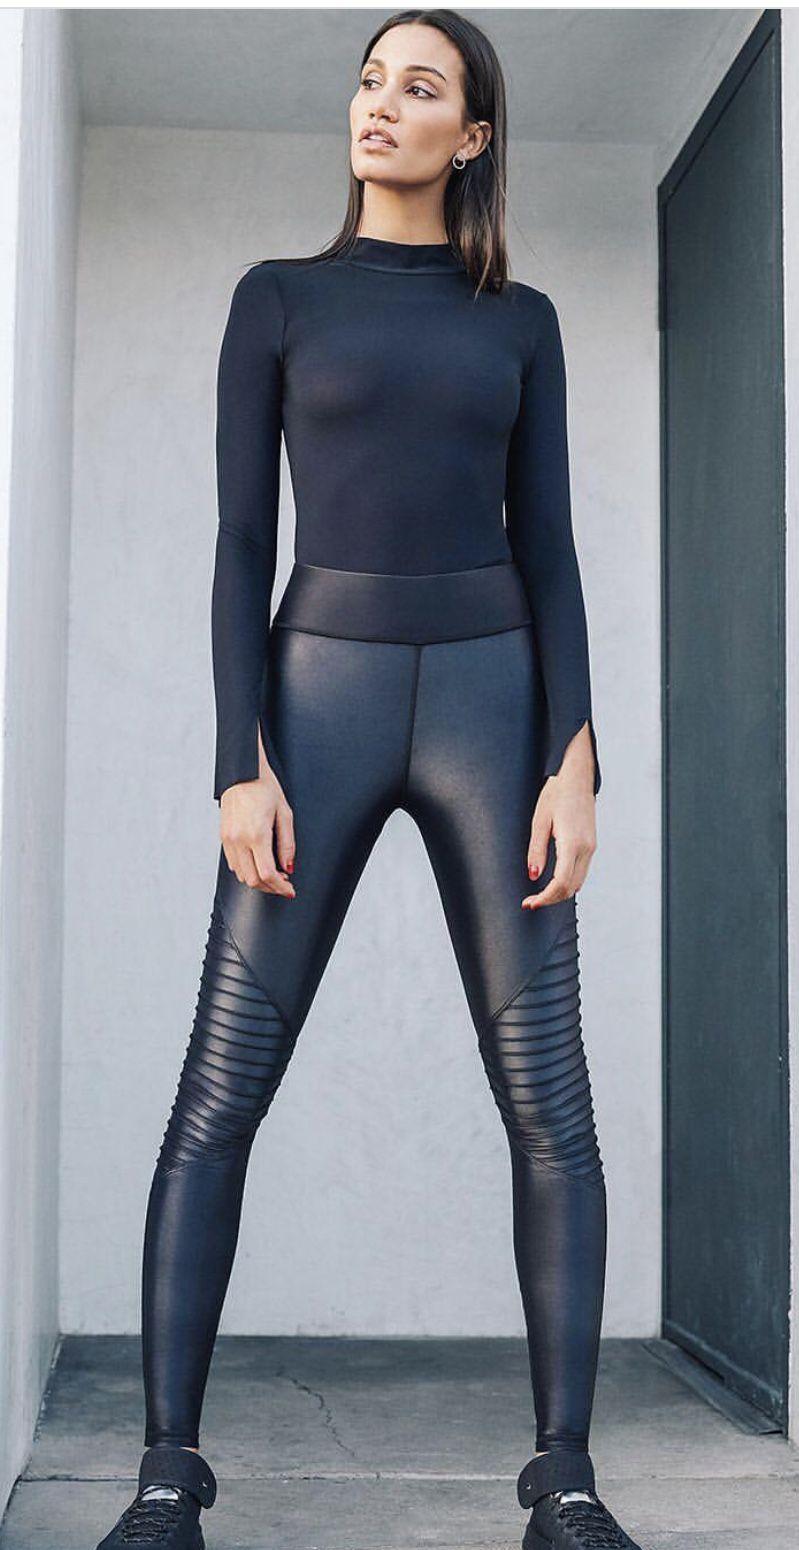 72ad99f4d20c 😊 😊 😊 😊 😊   Devil   Leggings, Leather pants outfit und Shiny ...